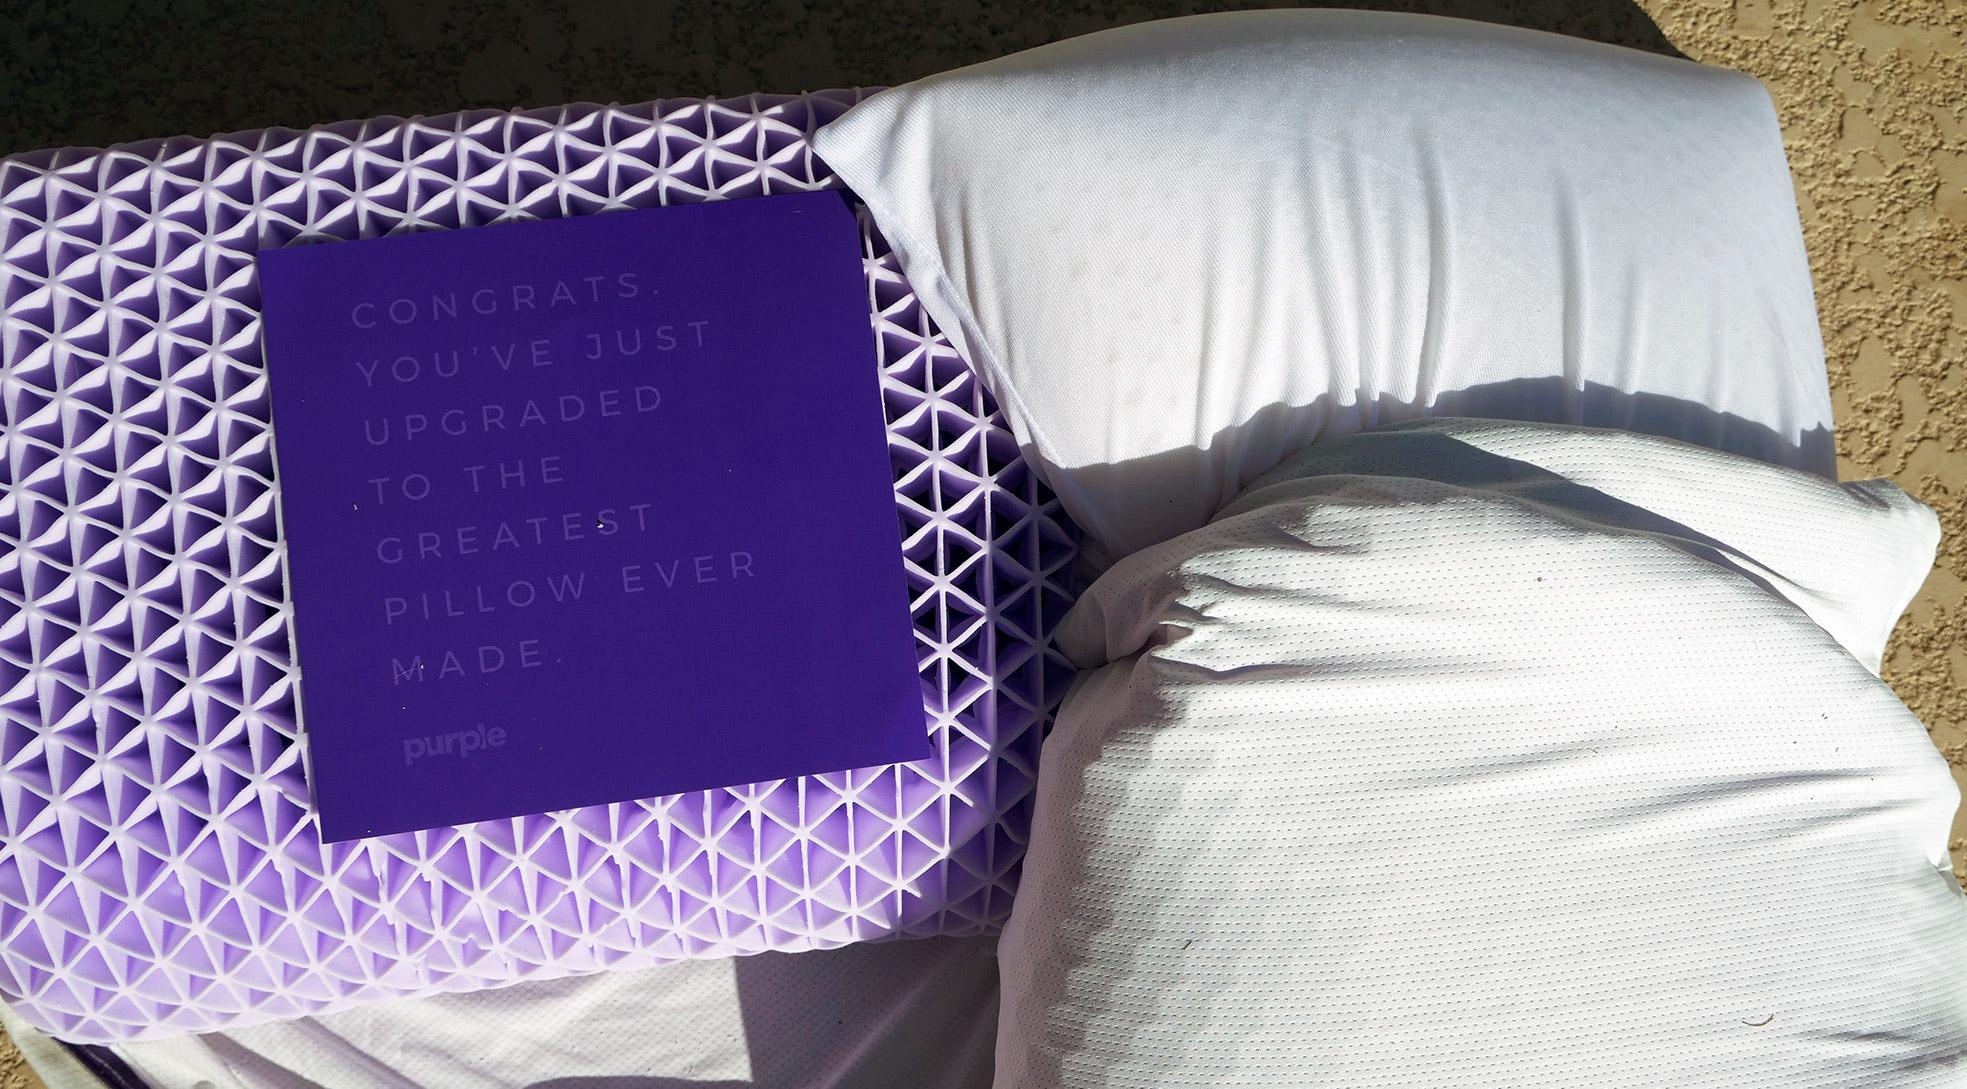 purple pillow on left purple harmony pillow on right